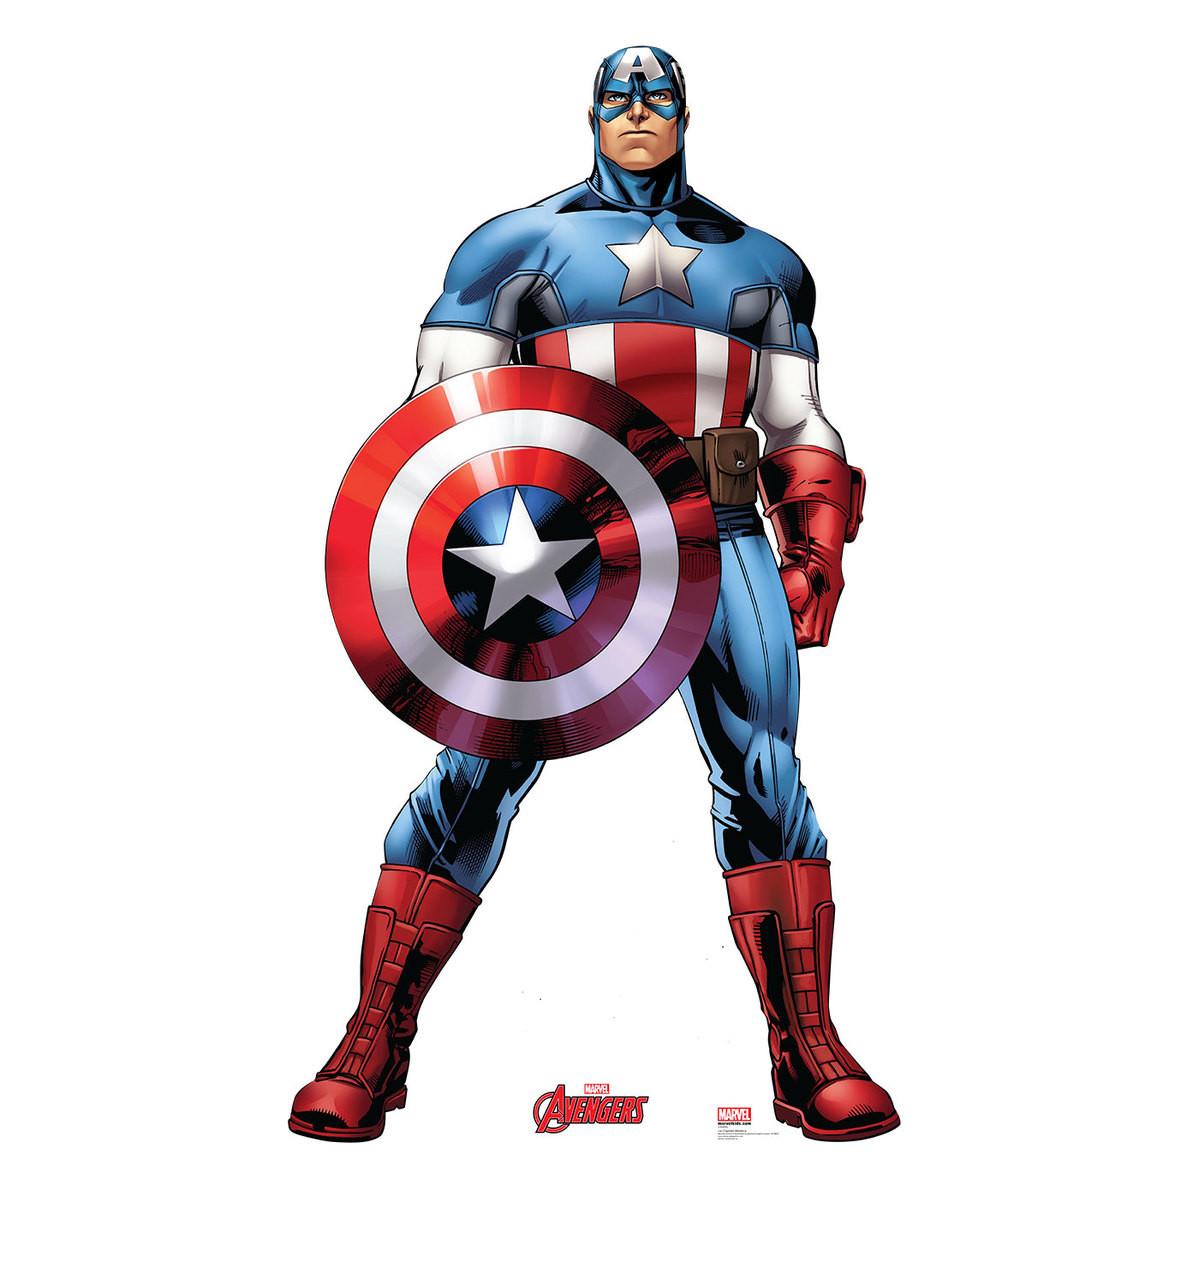 Life-size Captain America Cardboard Standup | Cardboard Cutout 2